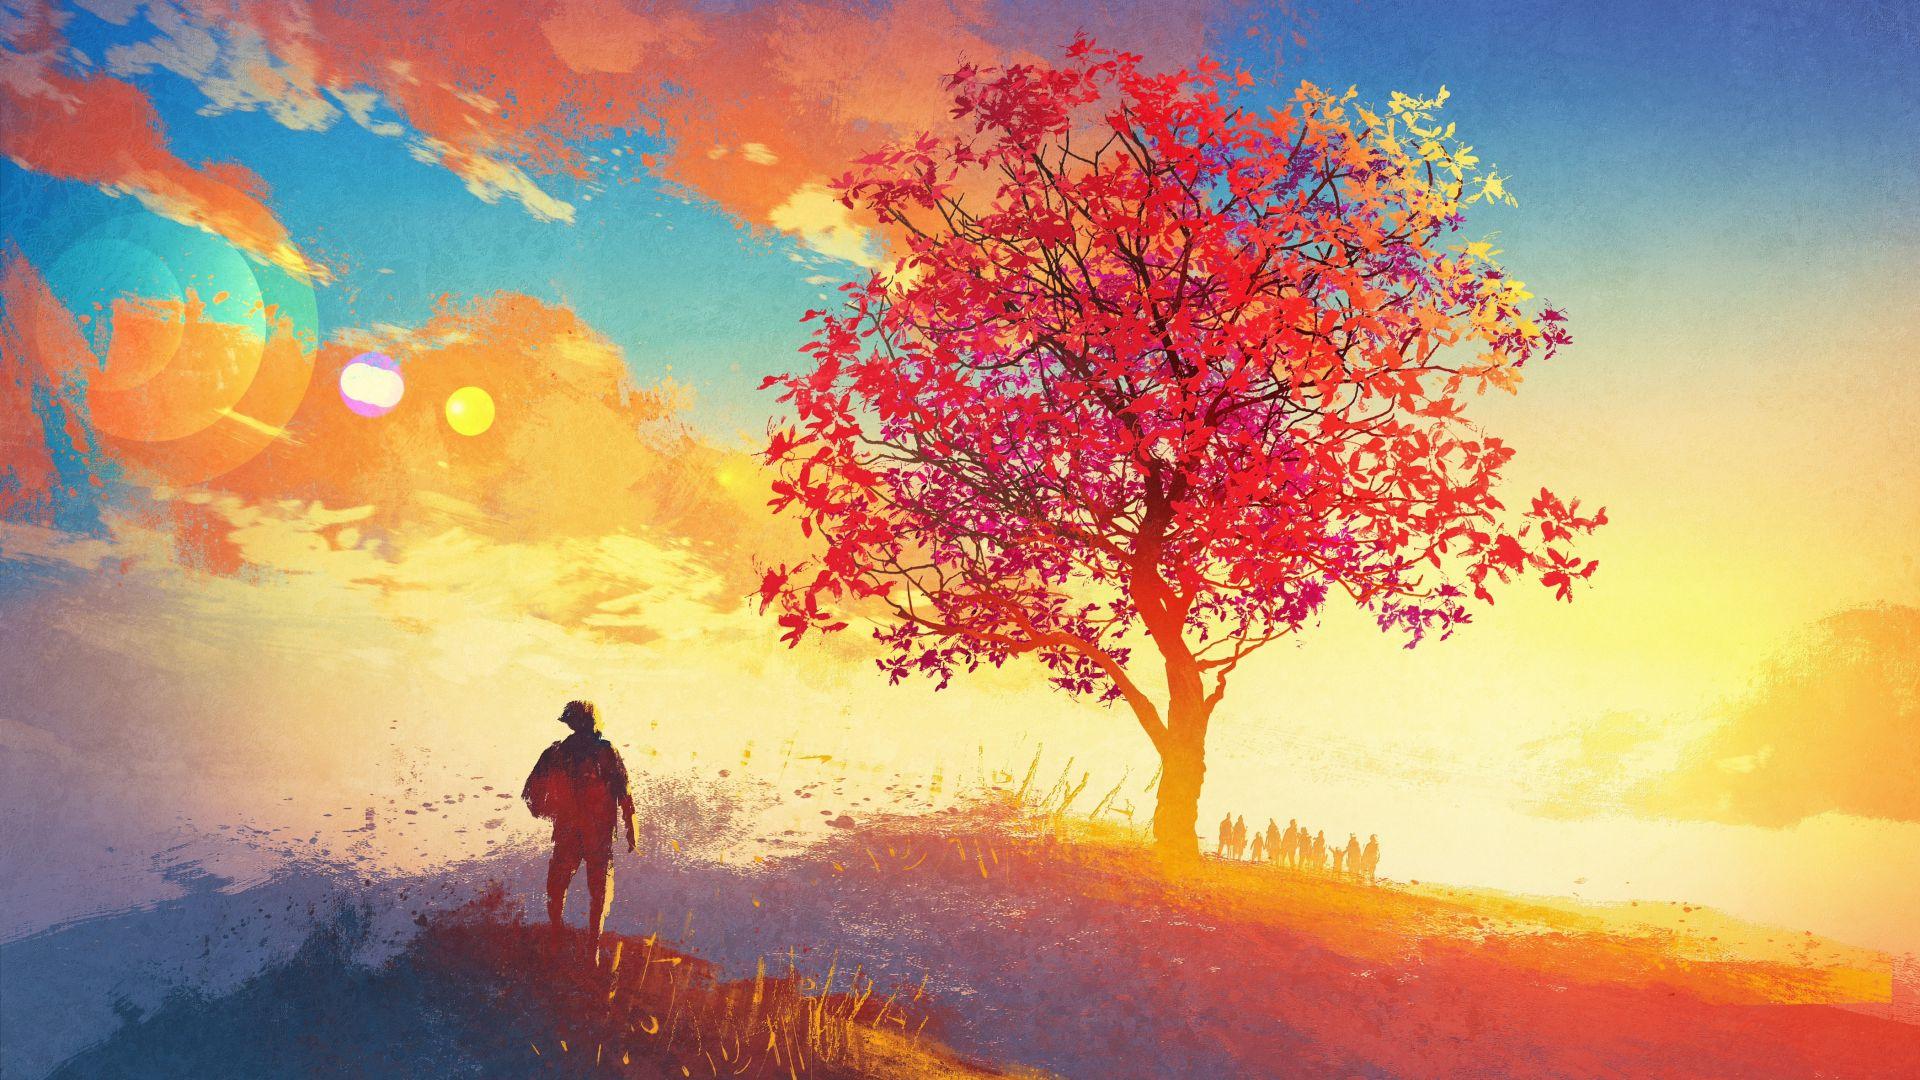 Wallpaper Colorful artwork of tree, landscape